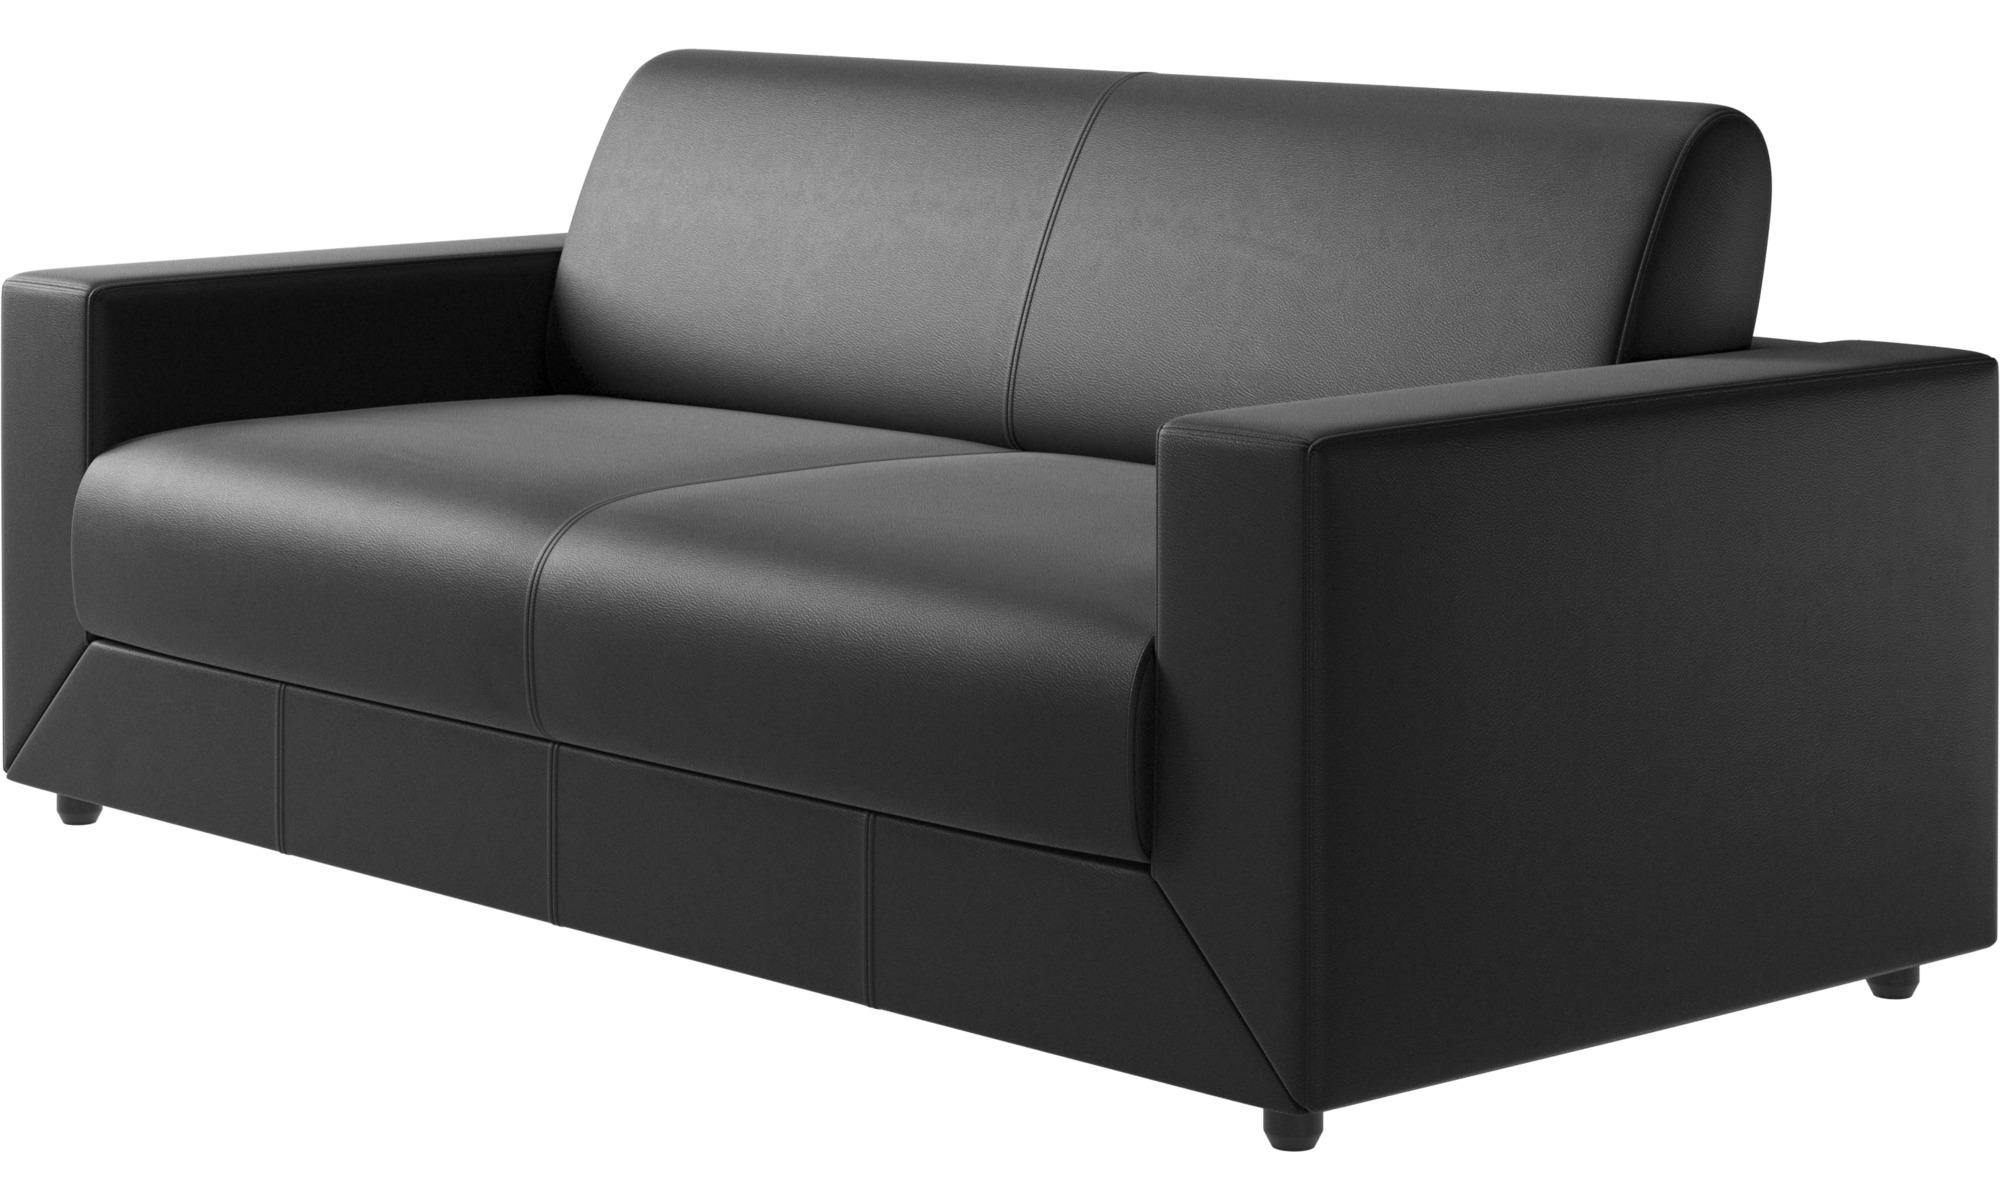 bo concept sofa bed melo 2 sofa bed boconcept cambridge melo 2 sofa bed. Black Bedroom Furniture Sets. Home Design Ideas